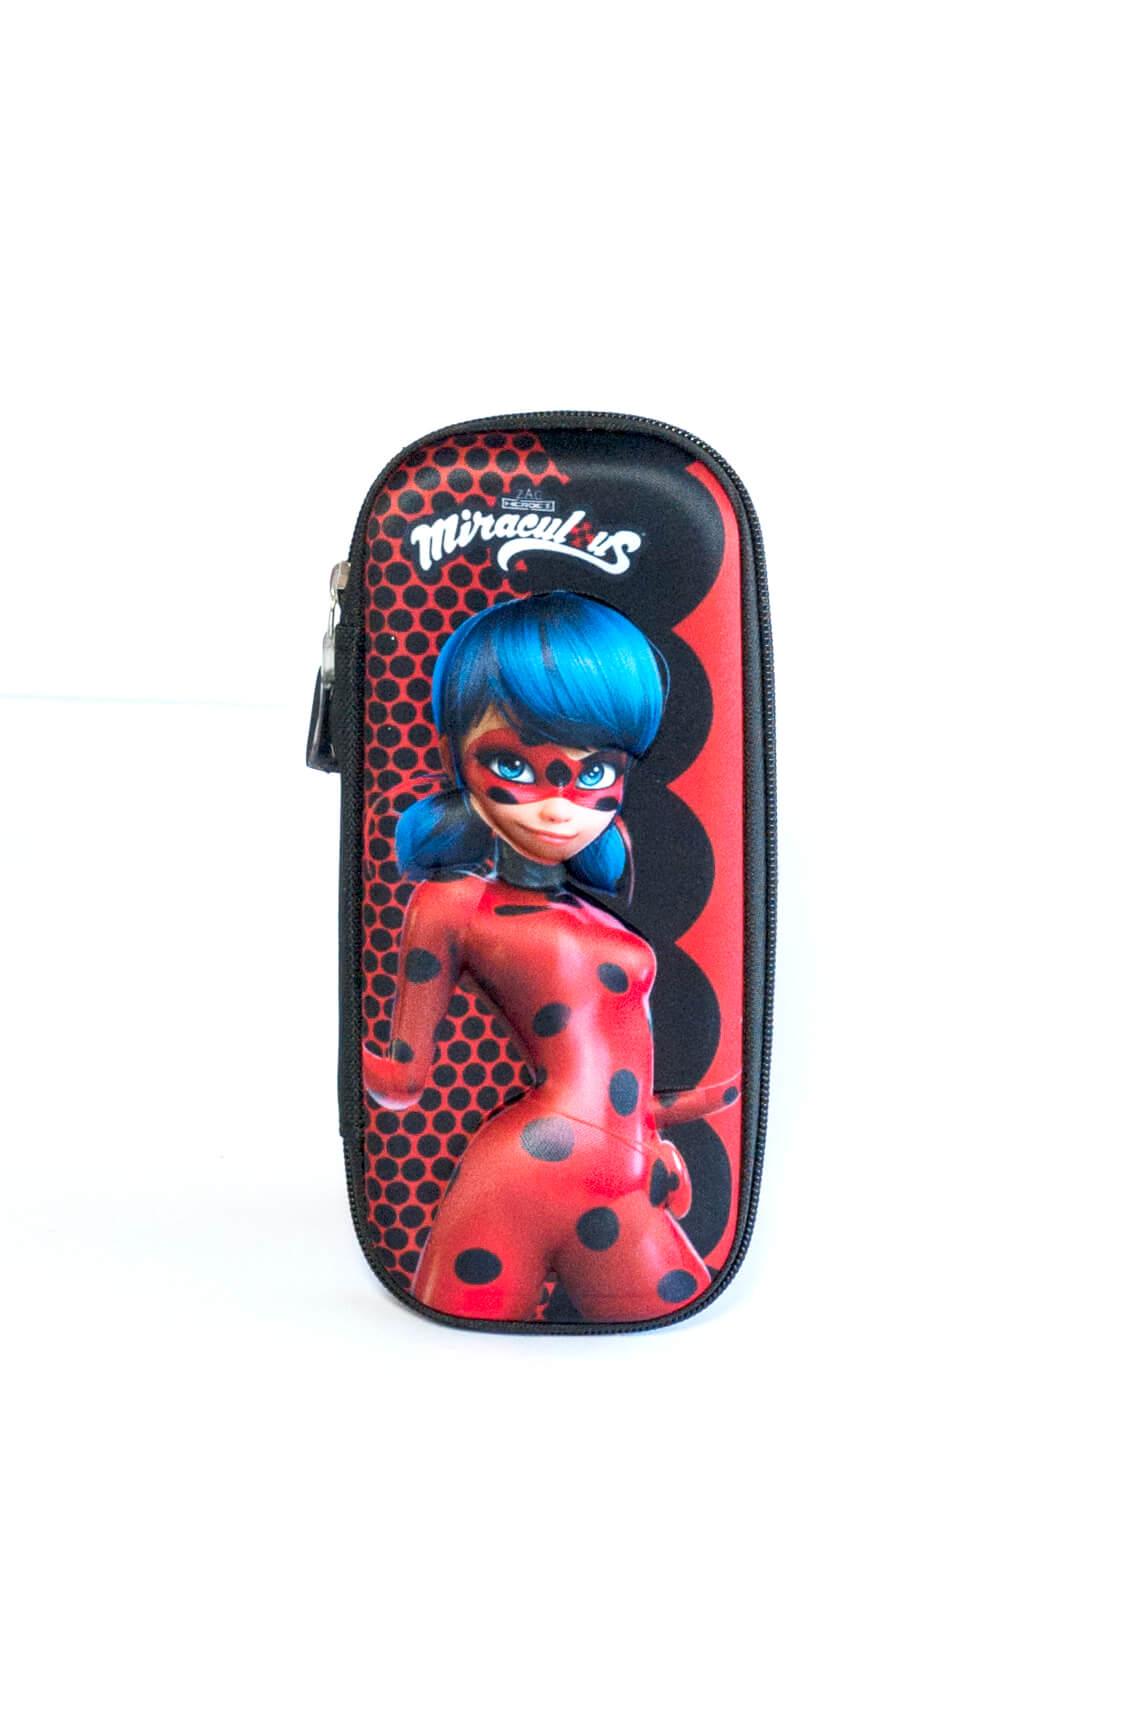 Estuche Ladybug Miraculous